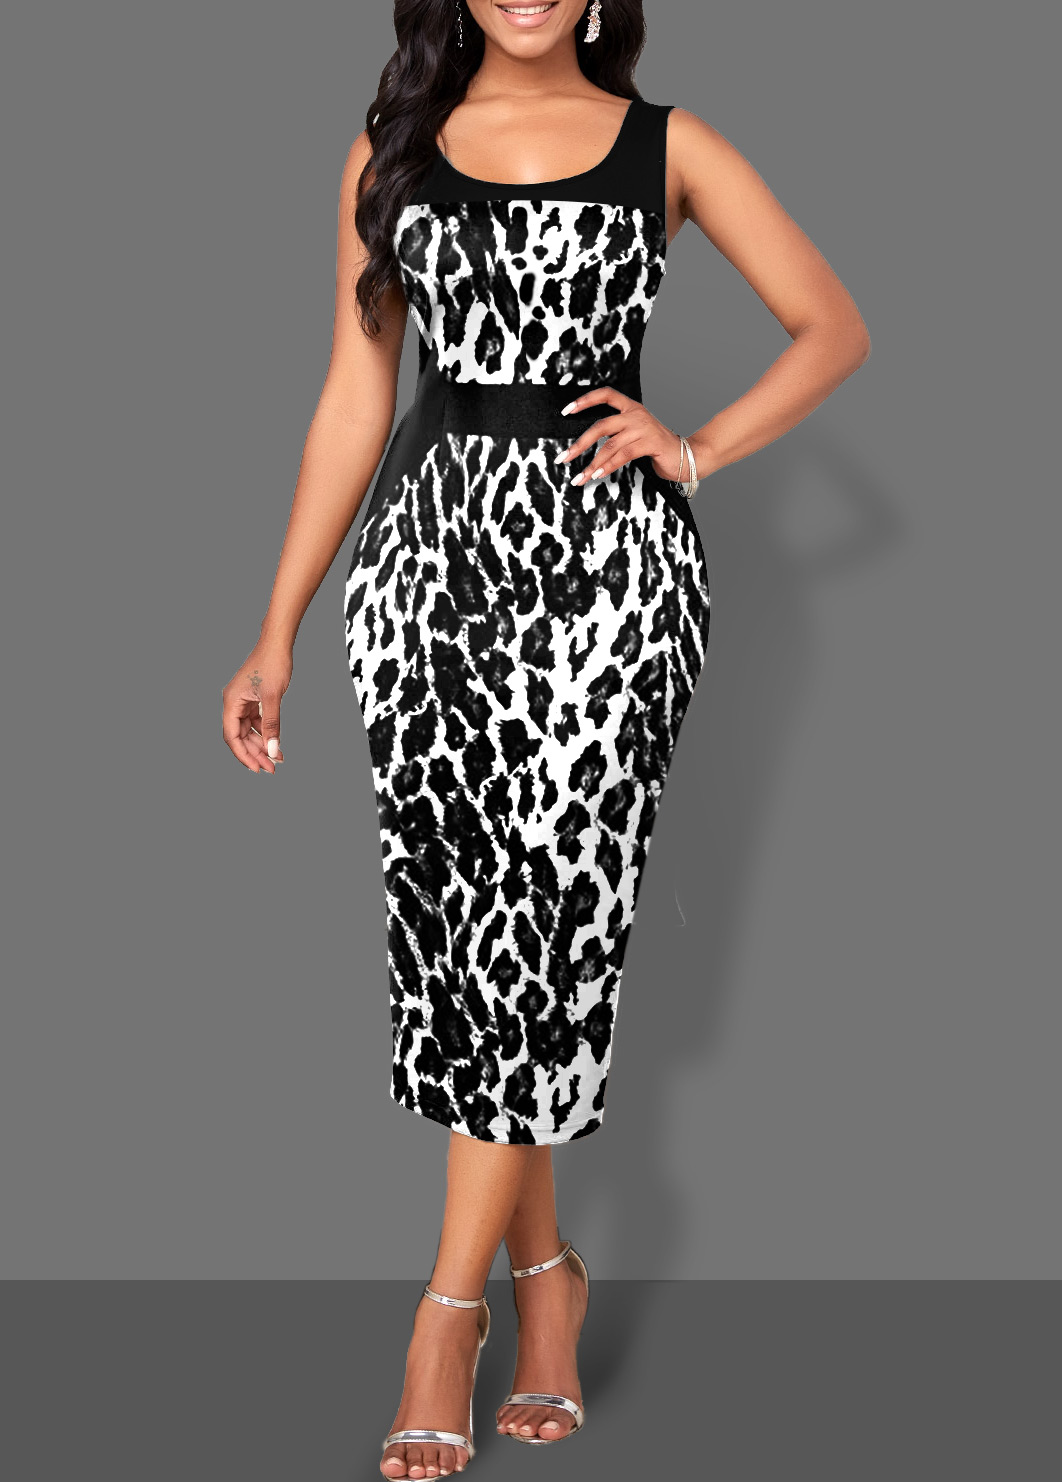 Wide Strap Bodycon Monochrome Leopard Dress